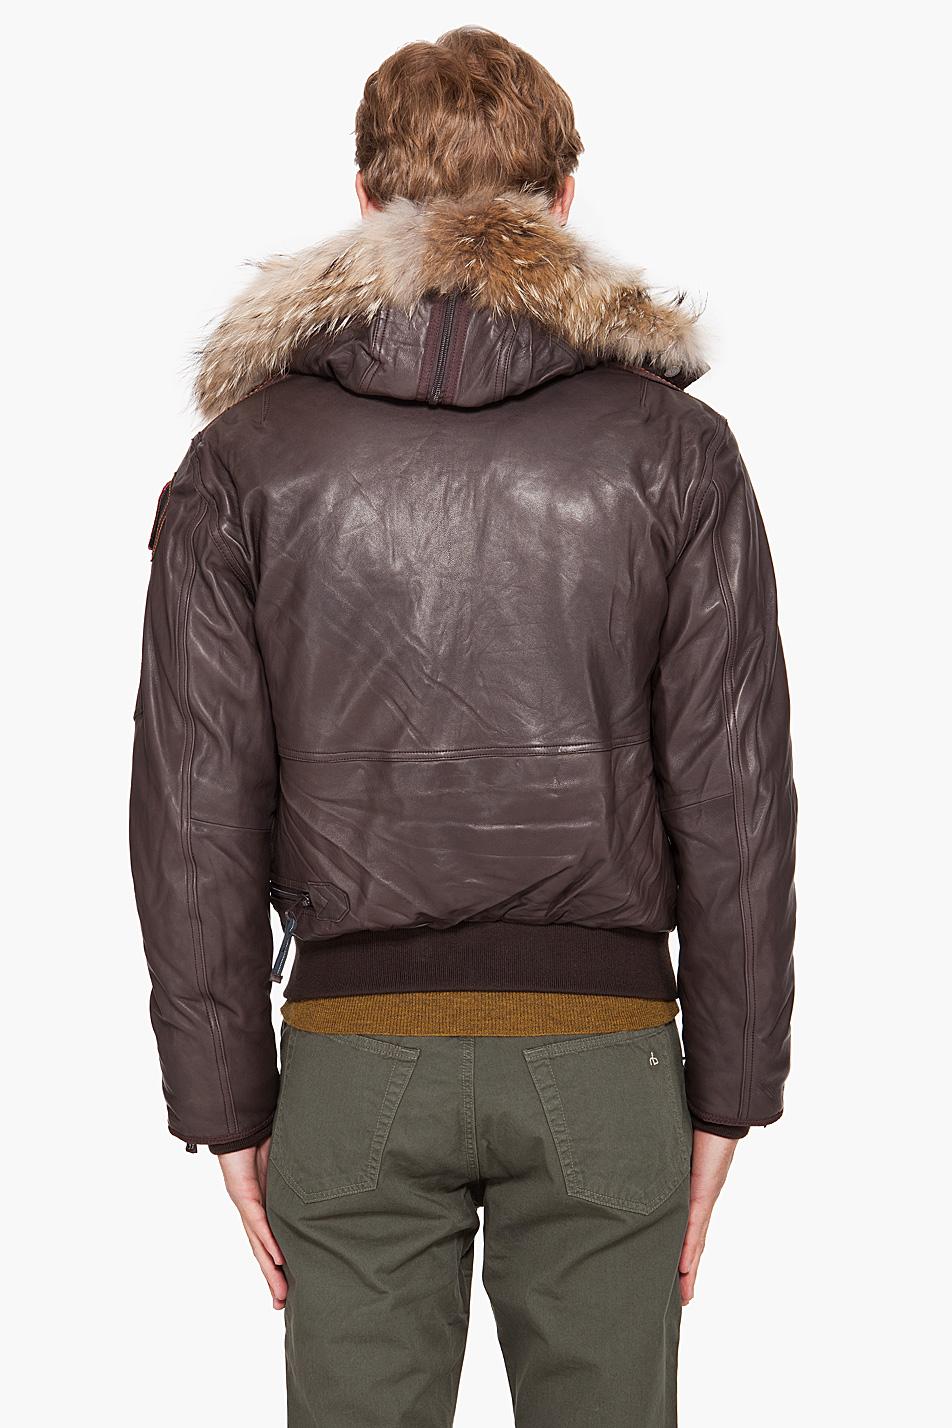 parajumpers leather jacket gobi brown